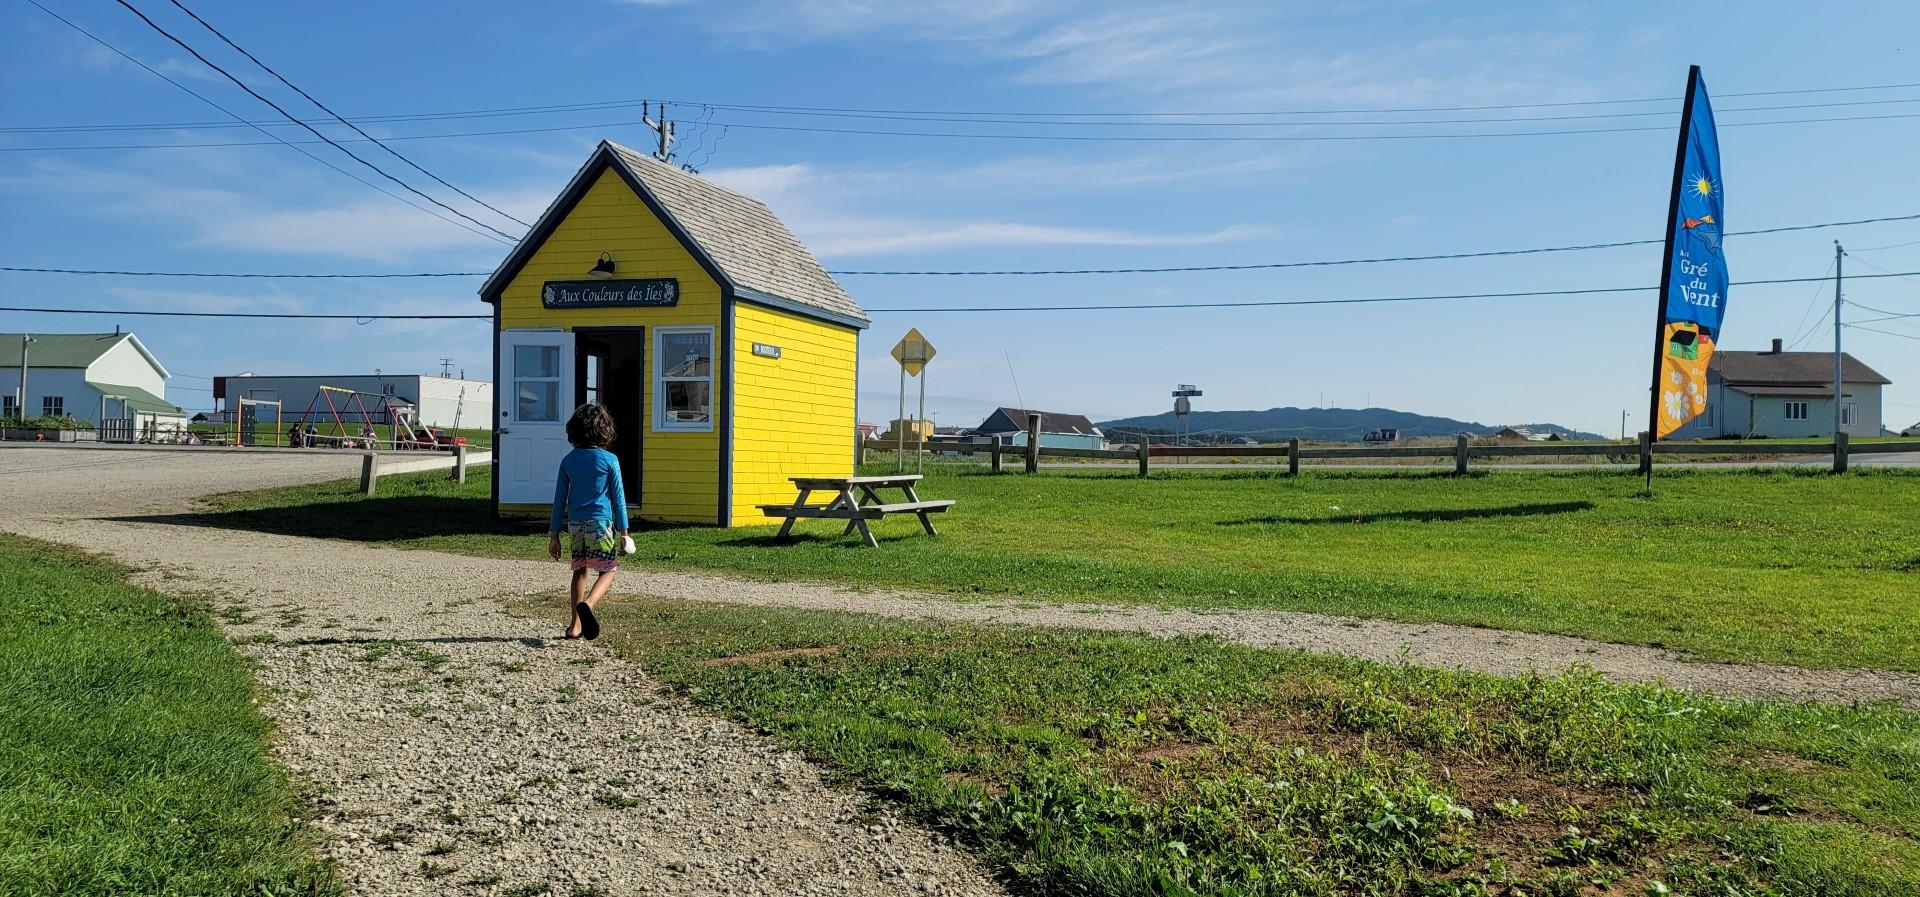 child walking to yellow house on Site de la Cote